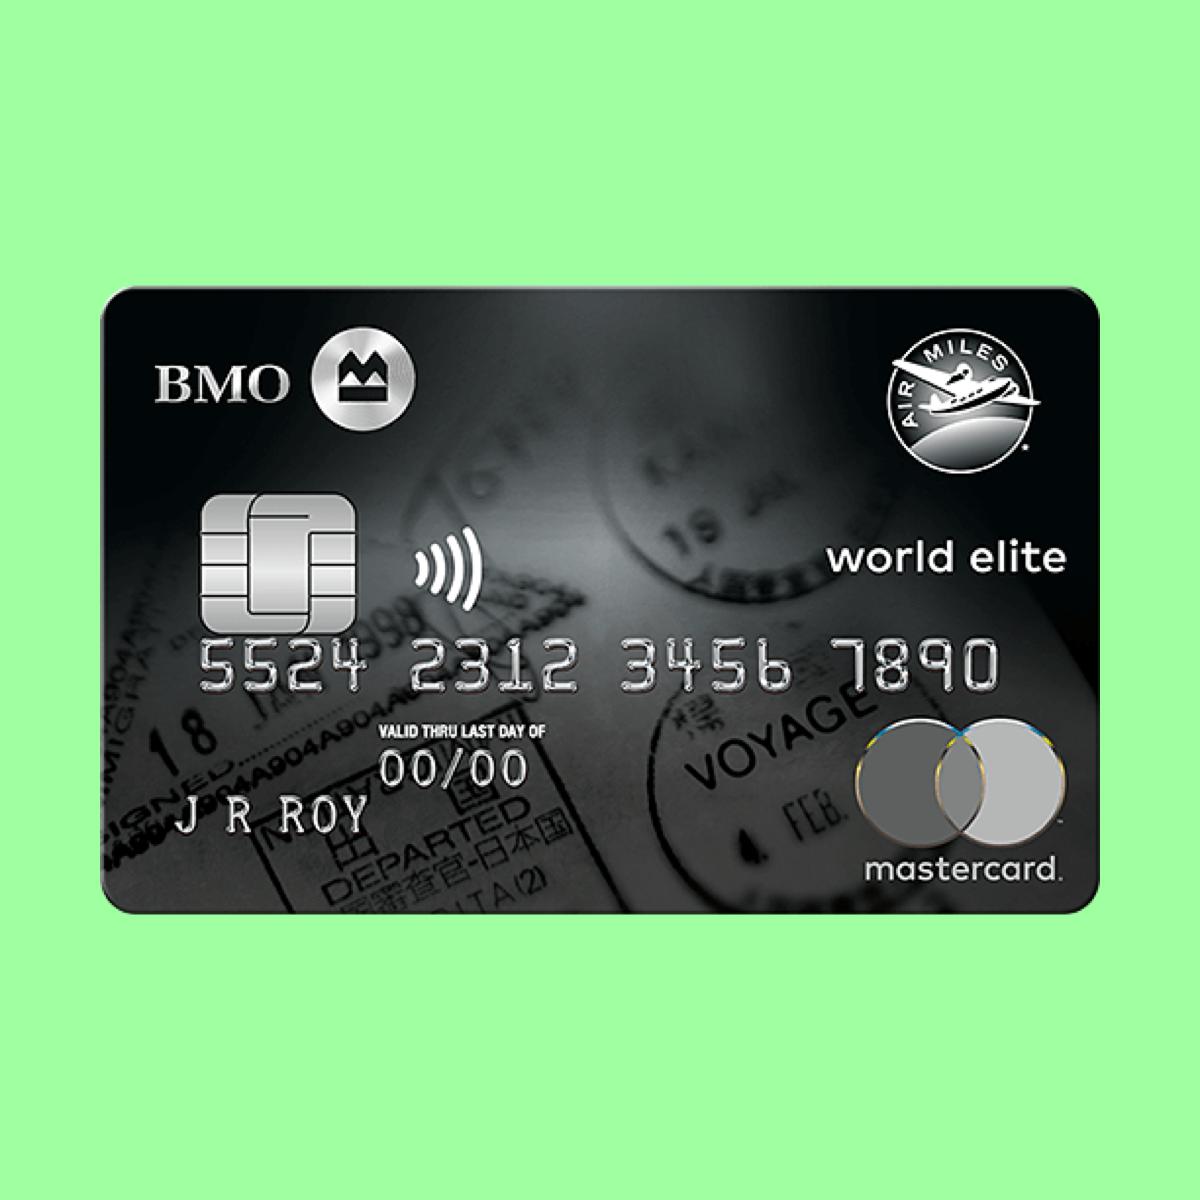 Bmo Air Miles World Elite Mastercard Canada Calculator Compare Cards Mastercard Credit Card Fees